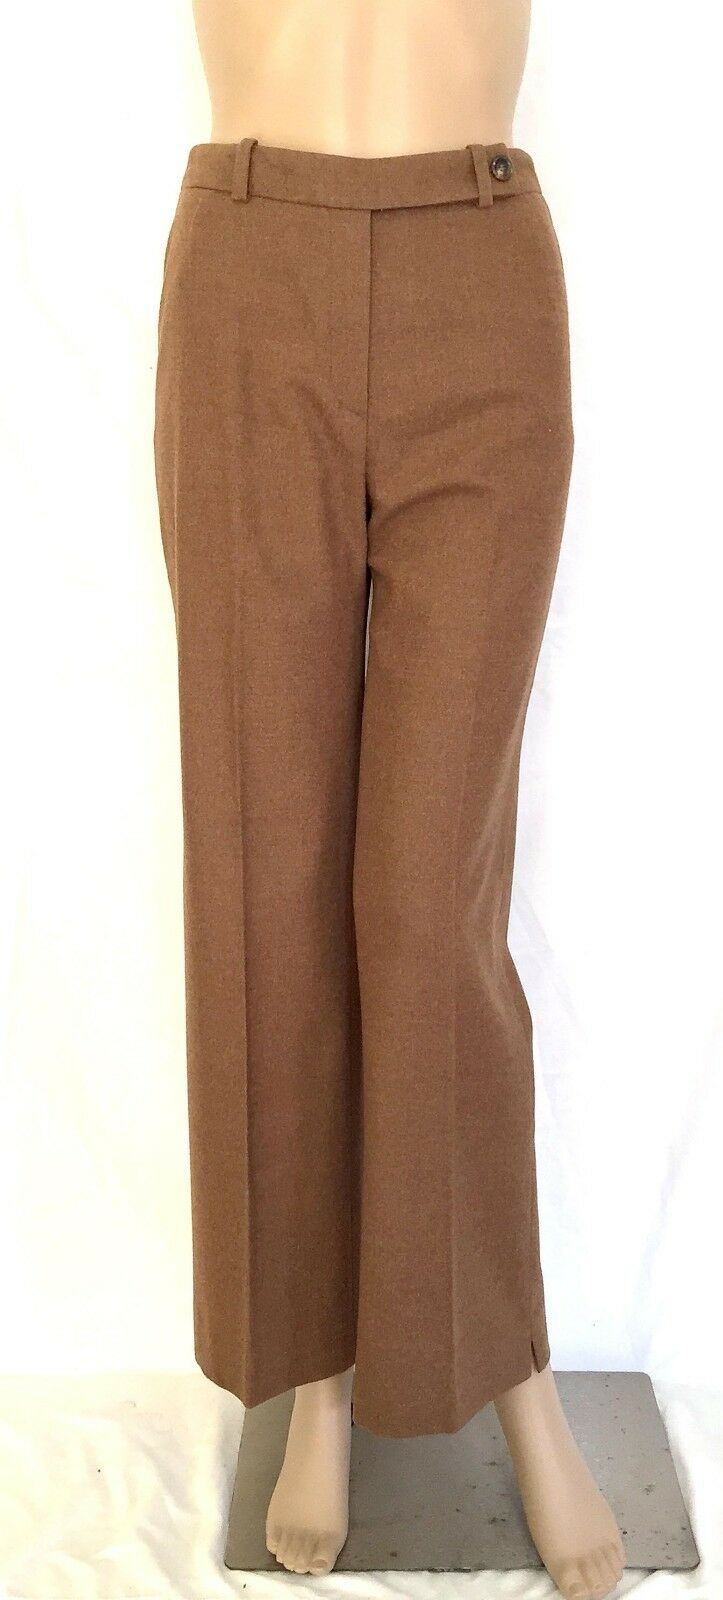 AKRIS Brown Wool Blend Tapered Straight Legged Pants - Size 4 - EUC